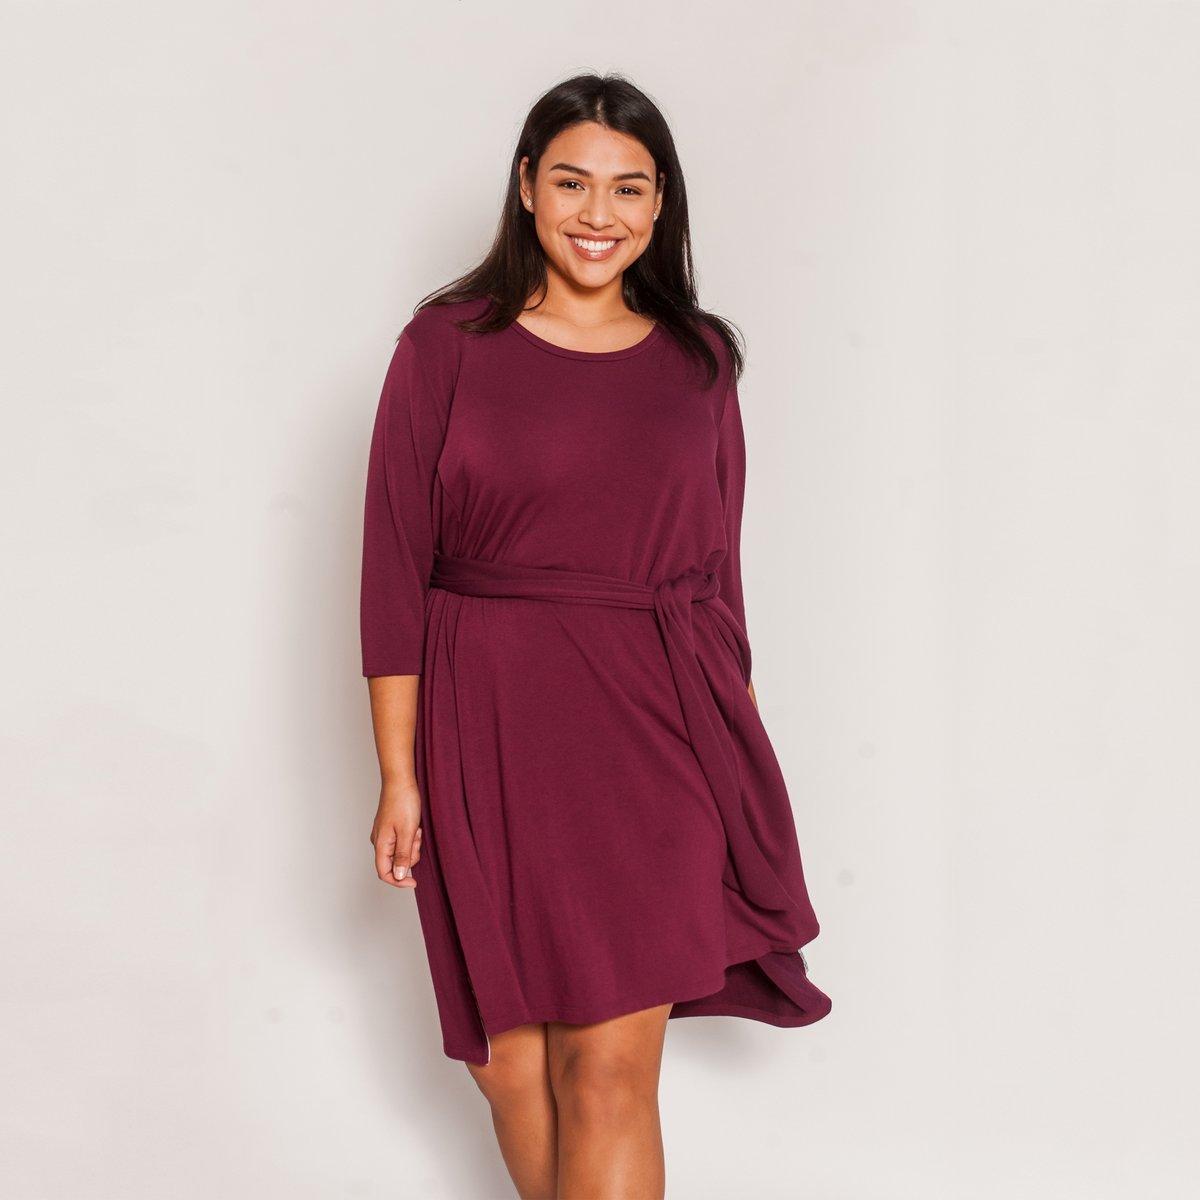 Best Plus-Size & Size-Inclusive Clothing Brands